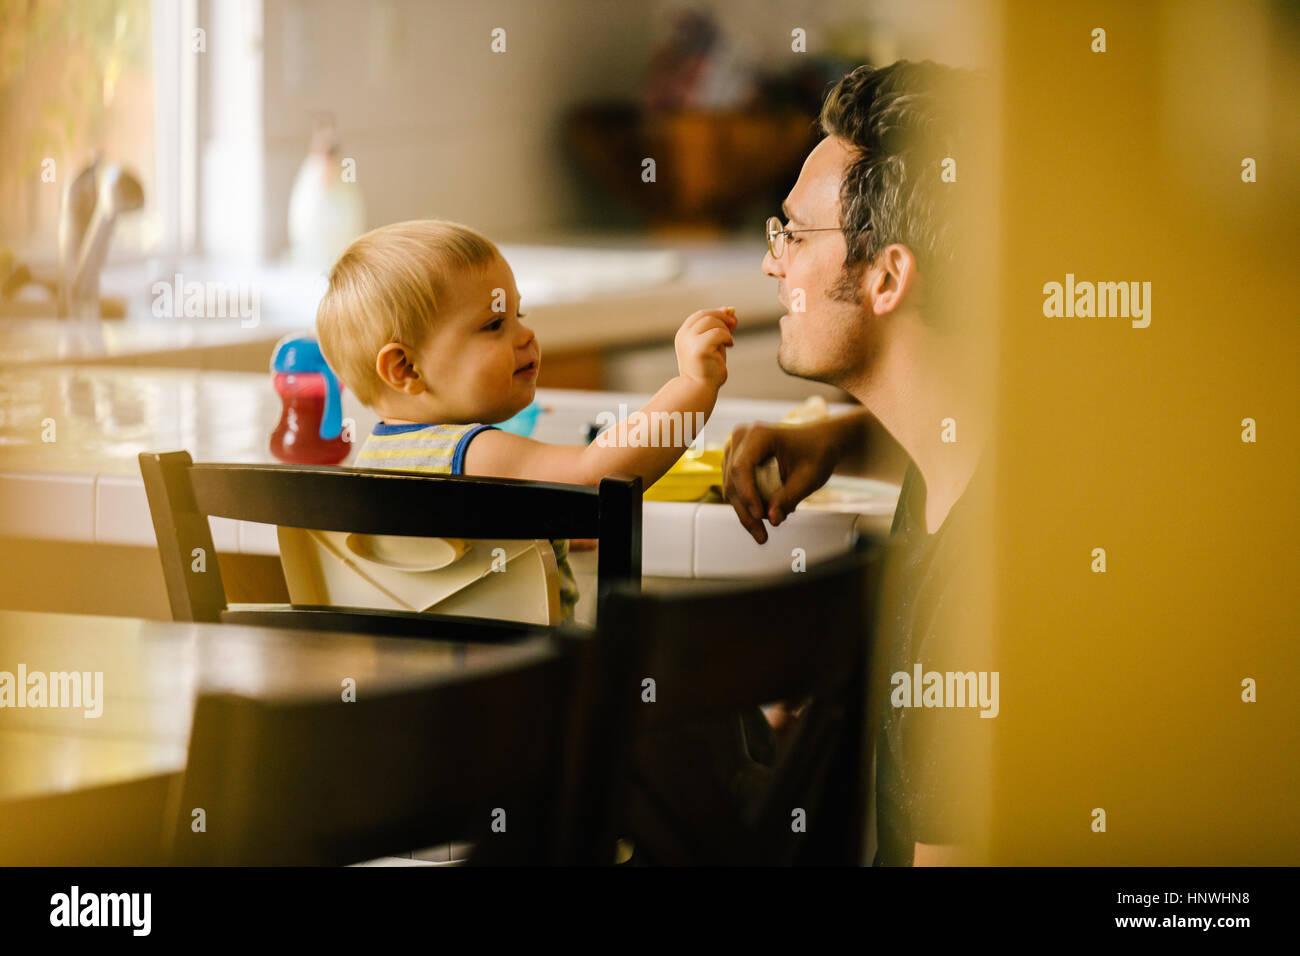 Vater Sohn zu helfen, zu den Mahlzeiten Stockbild